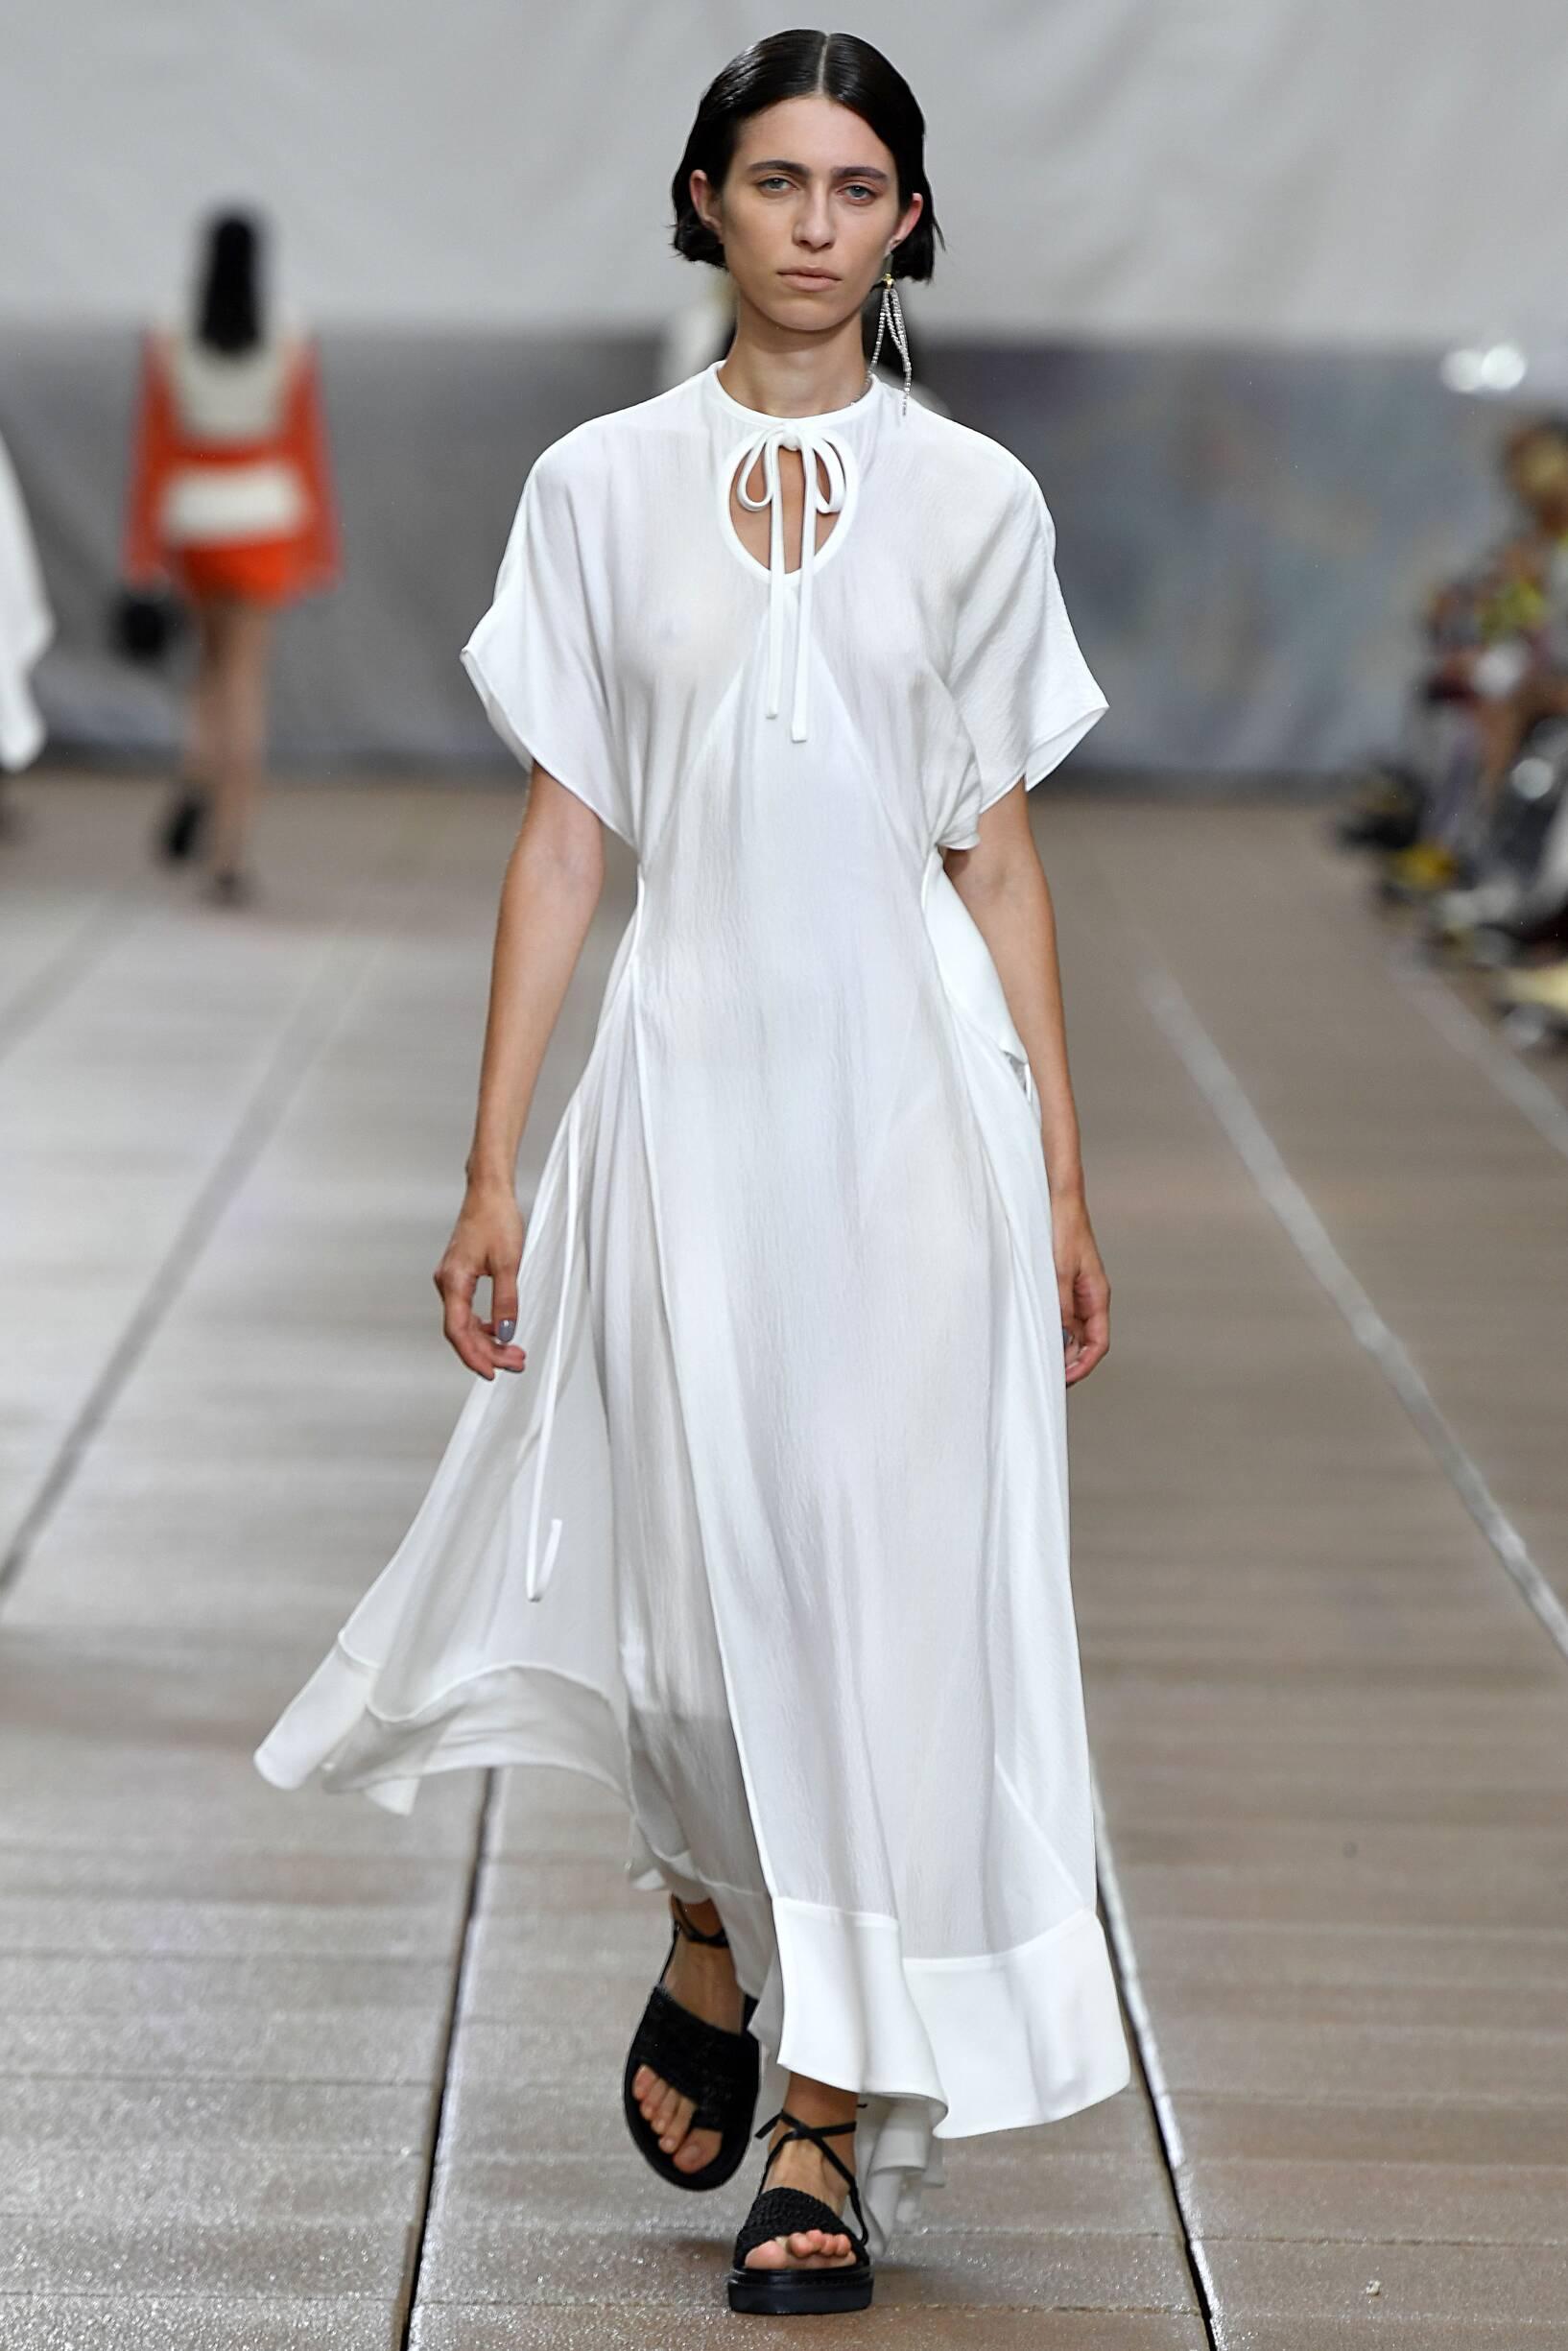 Spring Fashion Trends 2019 3.1 Phillip Lim